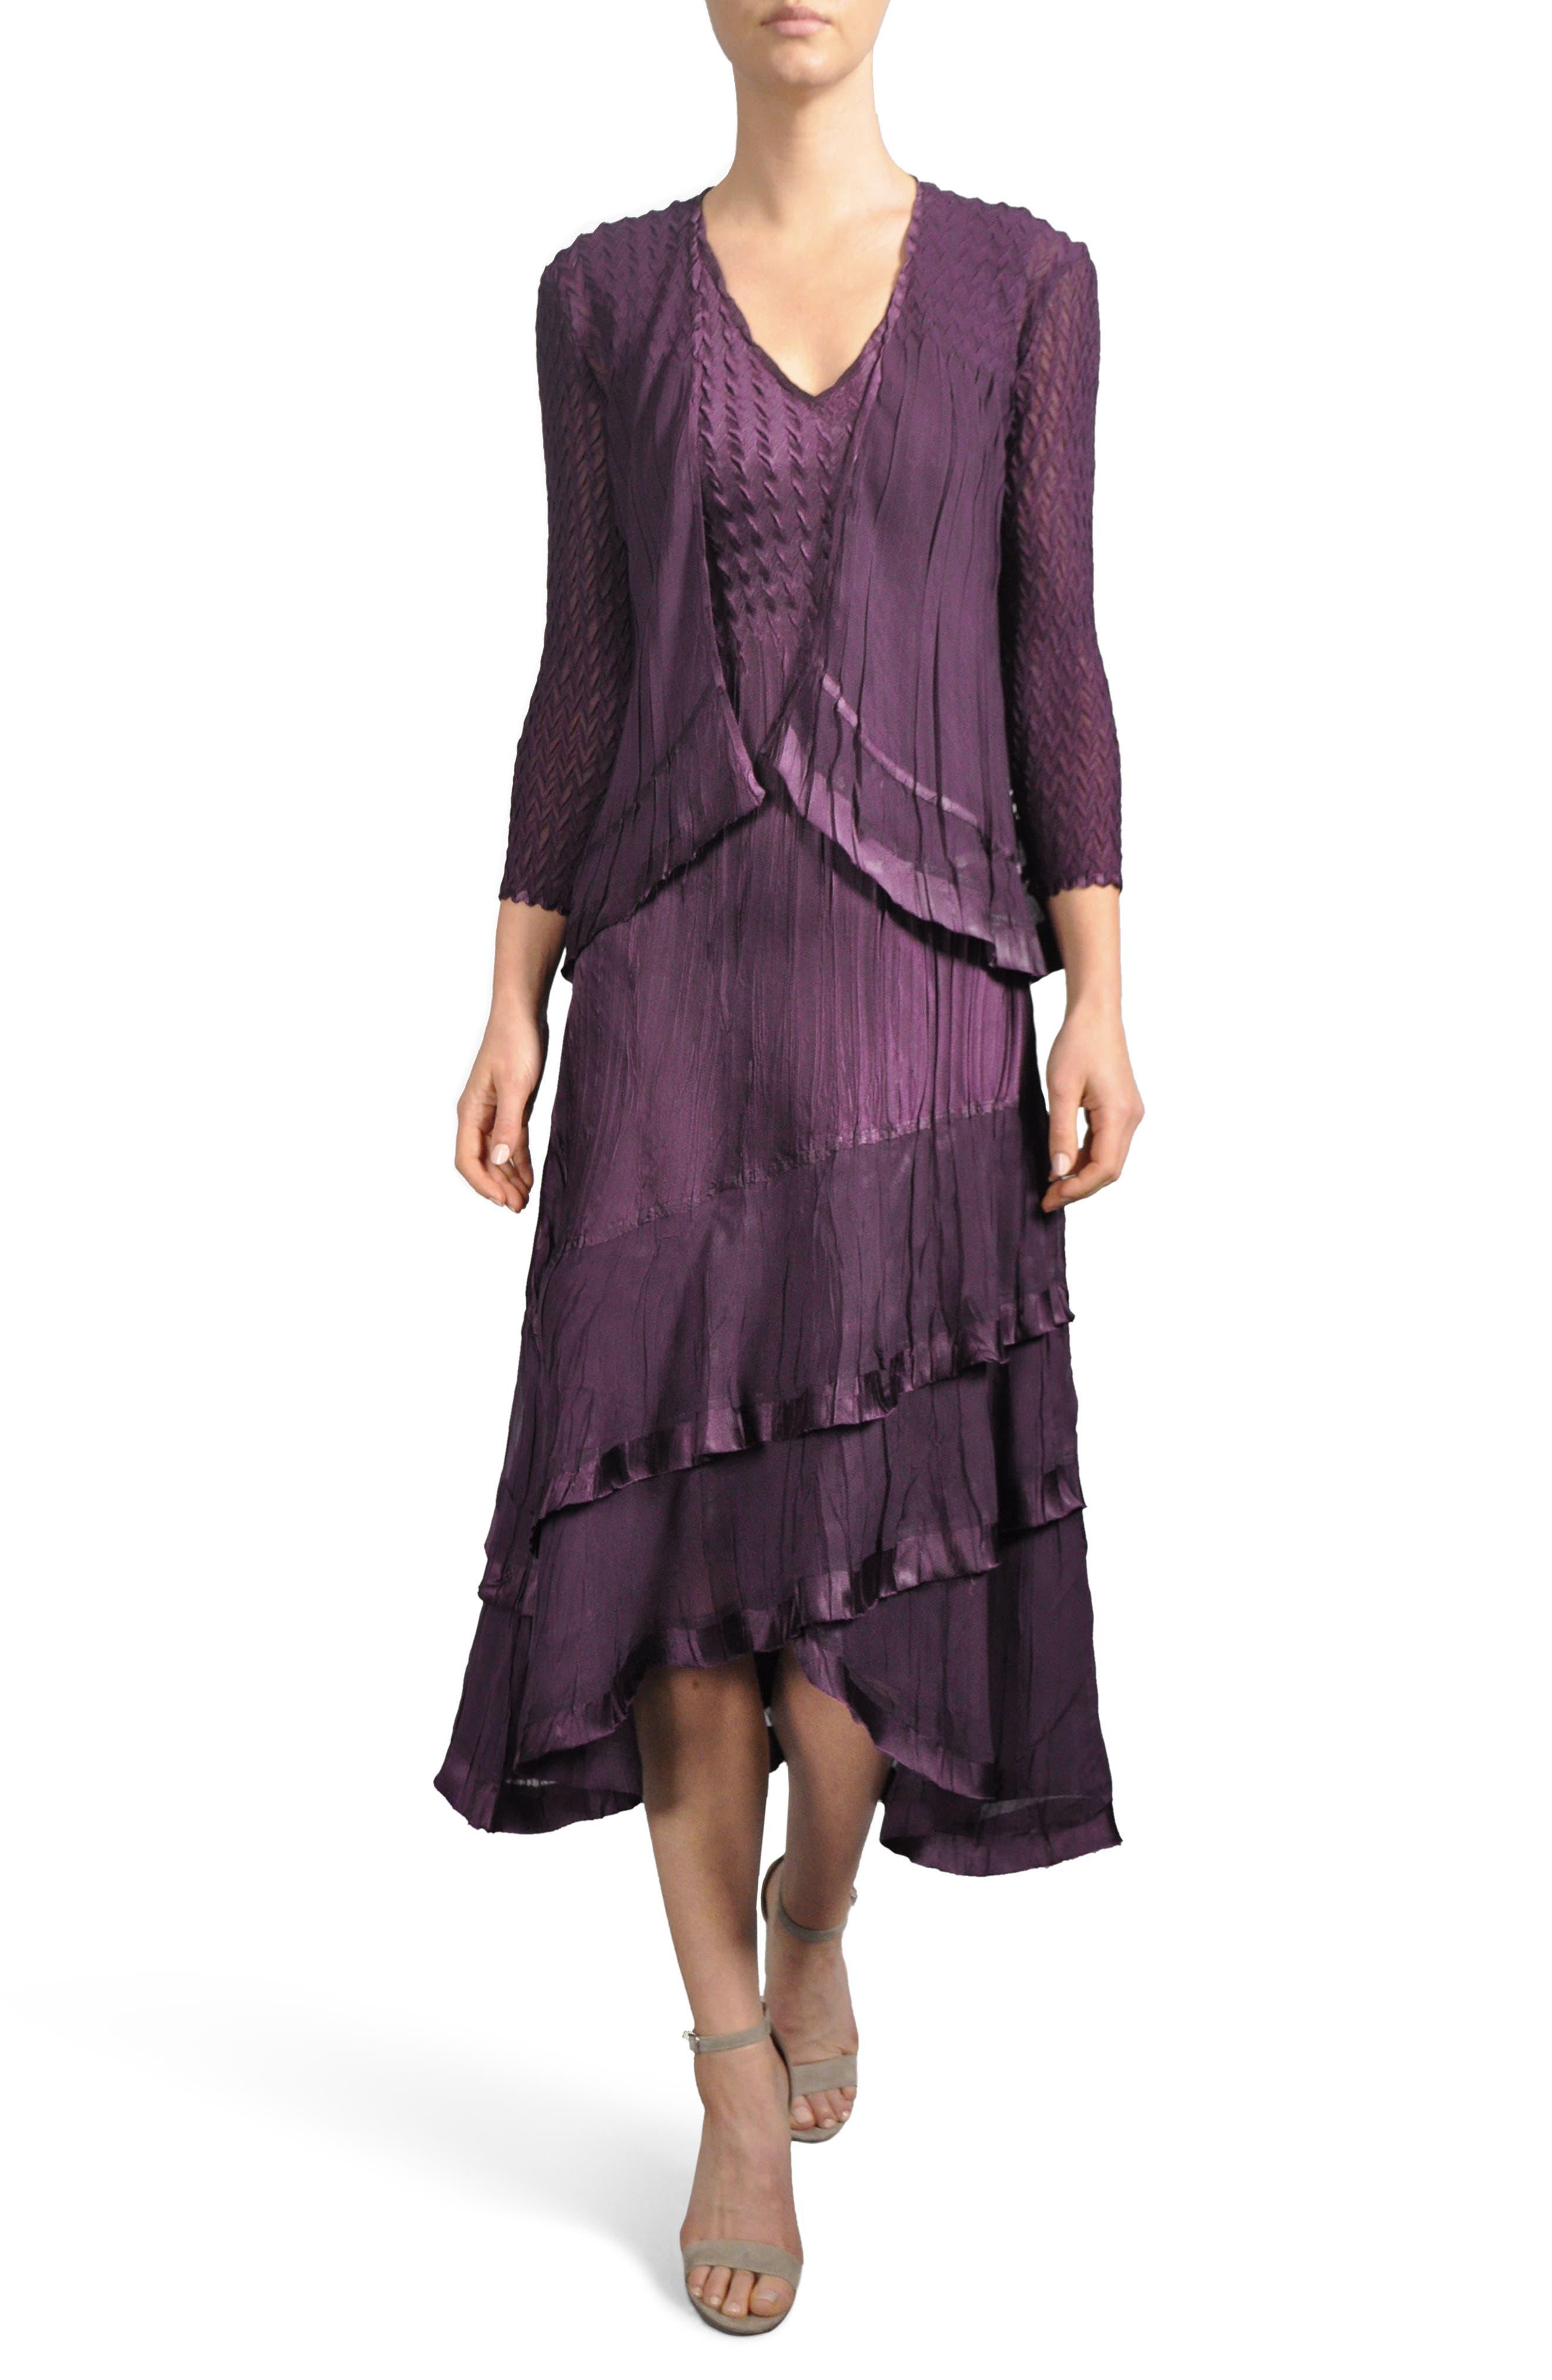 Main Image - Komorov Textured Tiered Midi Dress with Jacket